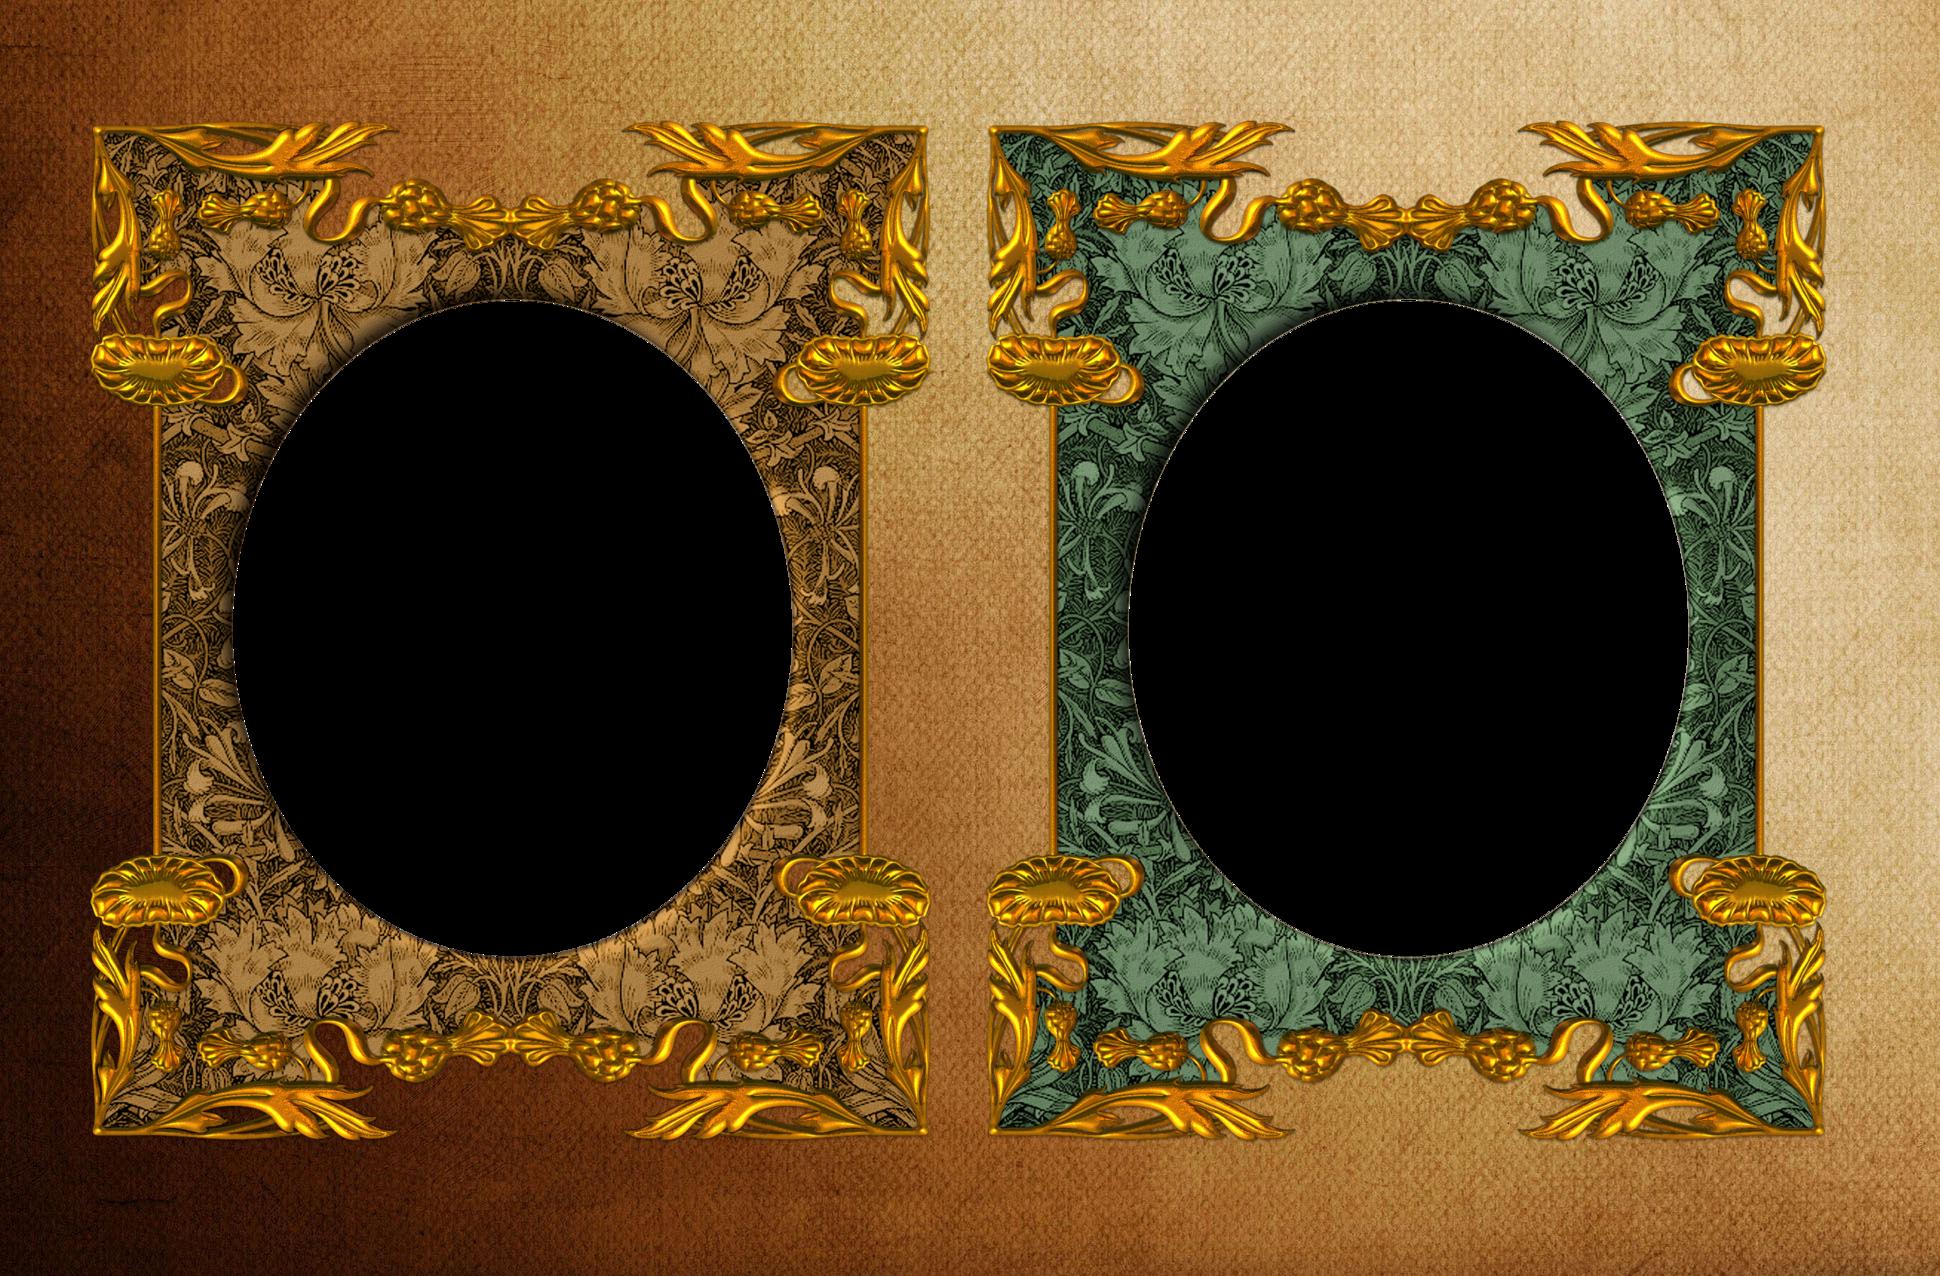 Фоторамка на прозрачном фоне с нотами картинки коробка